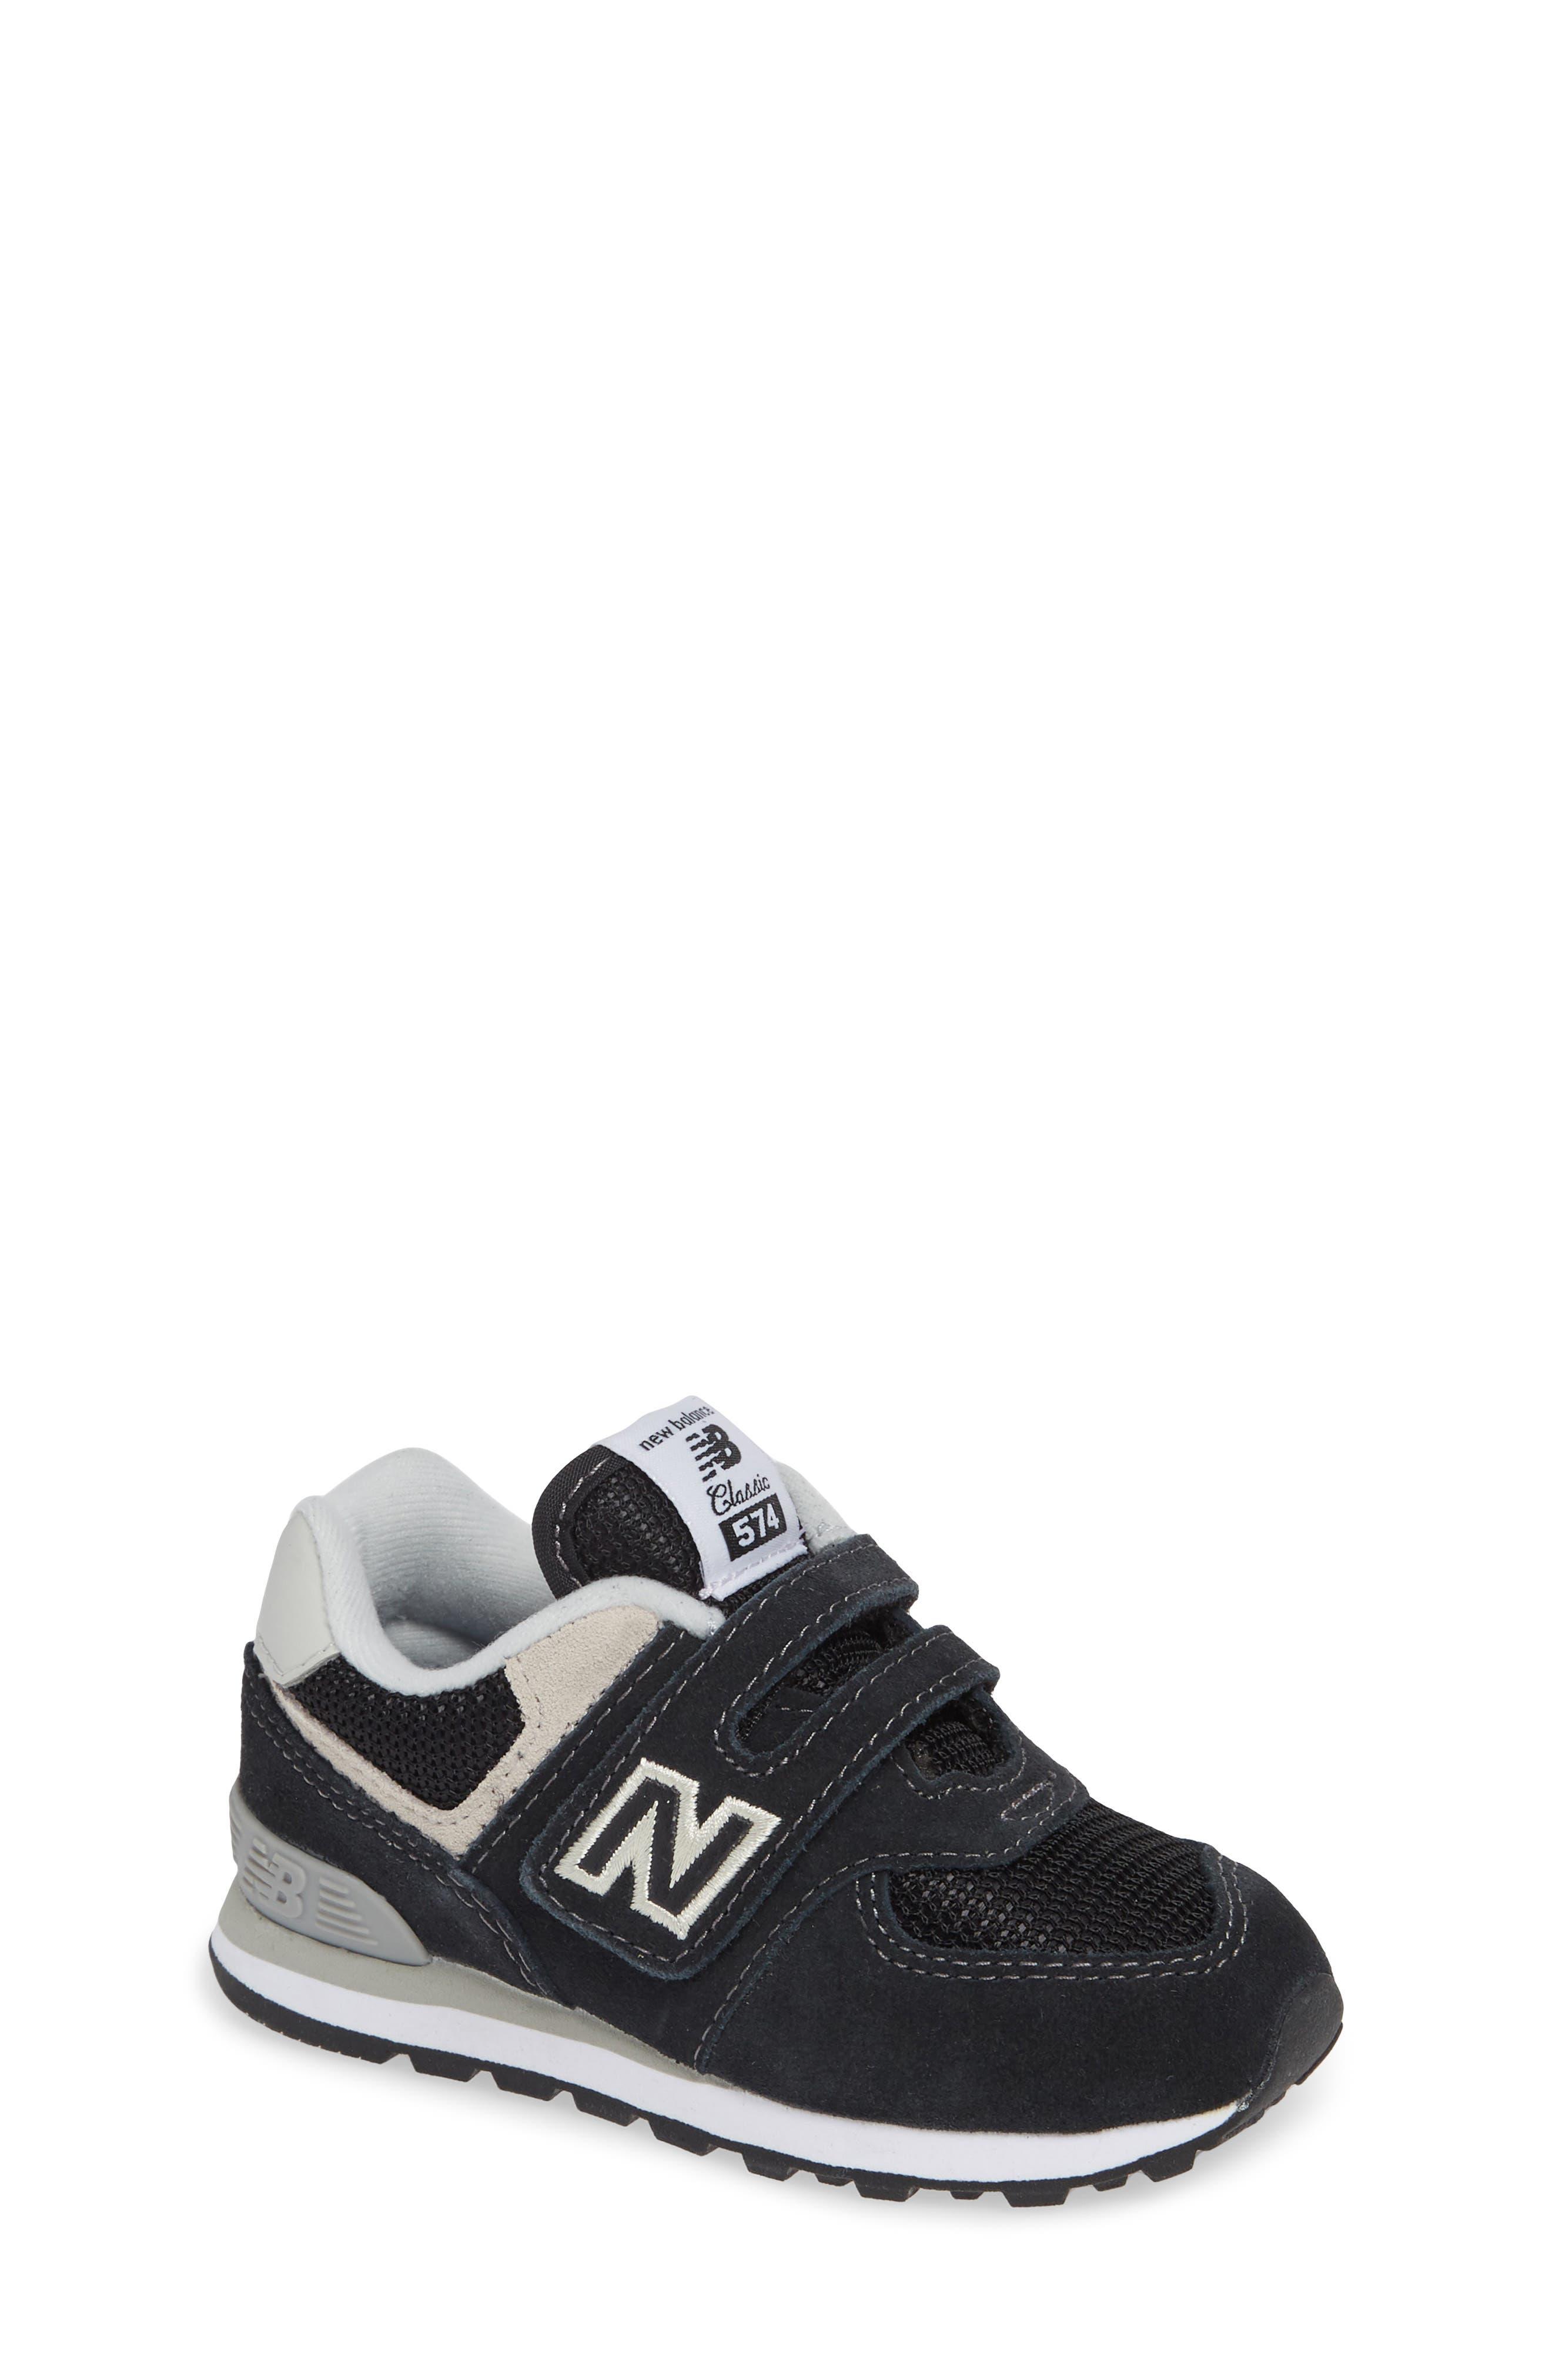 Toddler Boys New Balance 574 Core Sneaker Size 65 M  Black